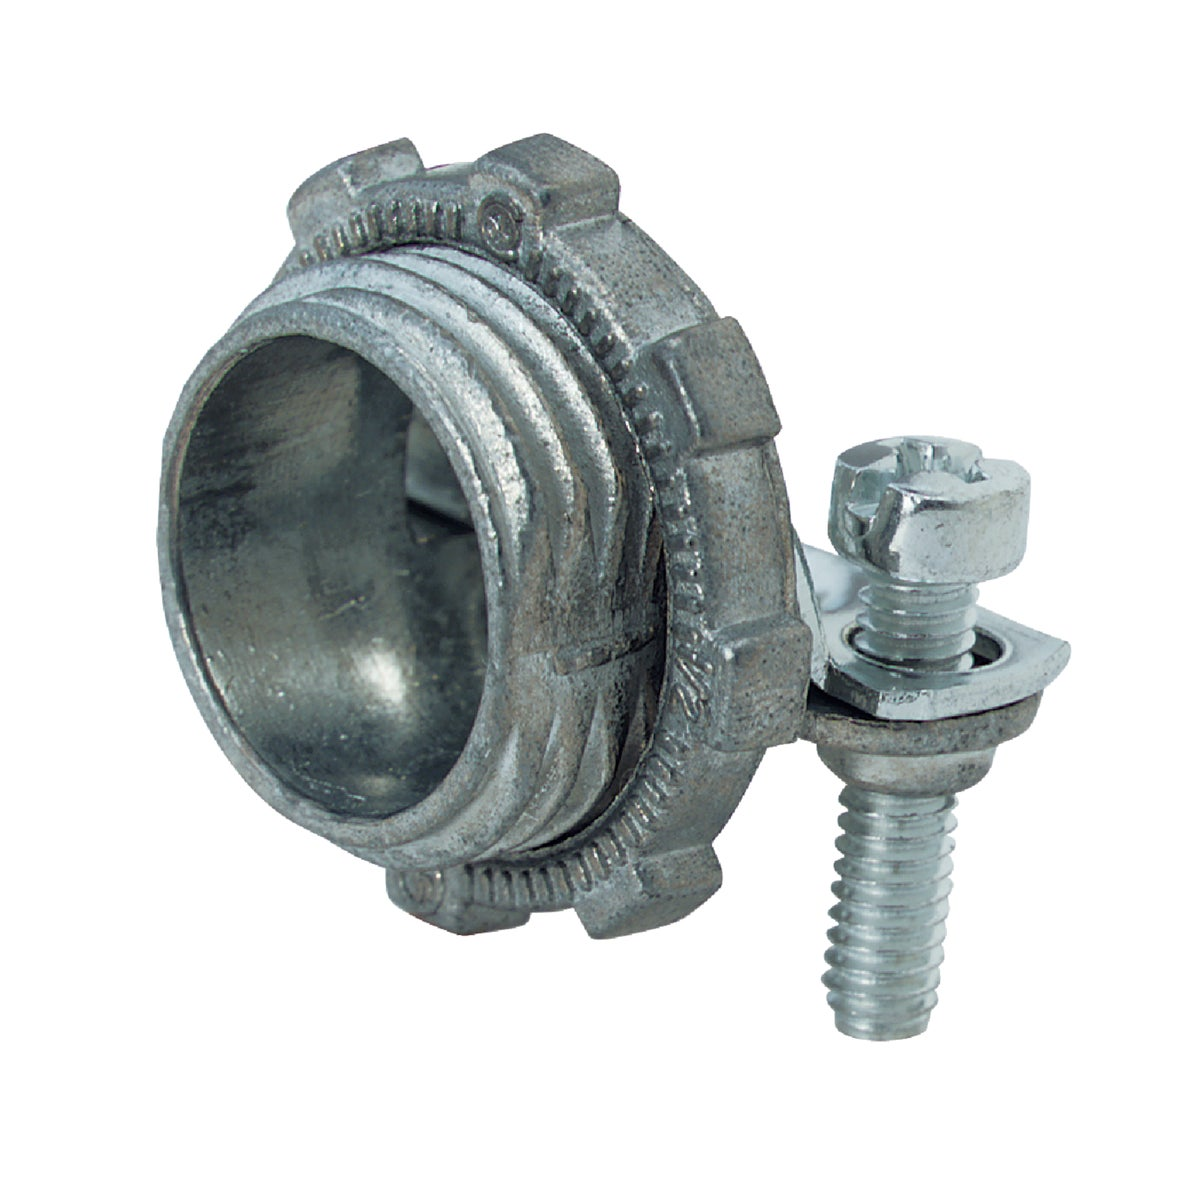 Steel City Die-Cast Zinc Box Connector